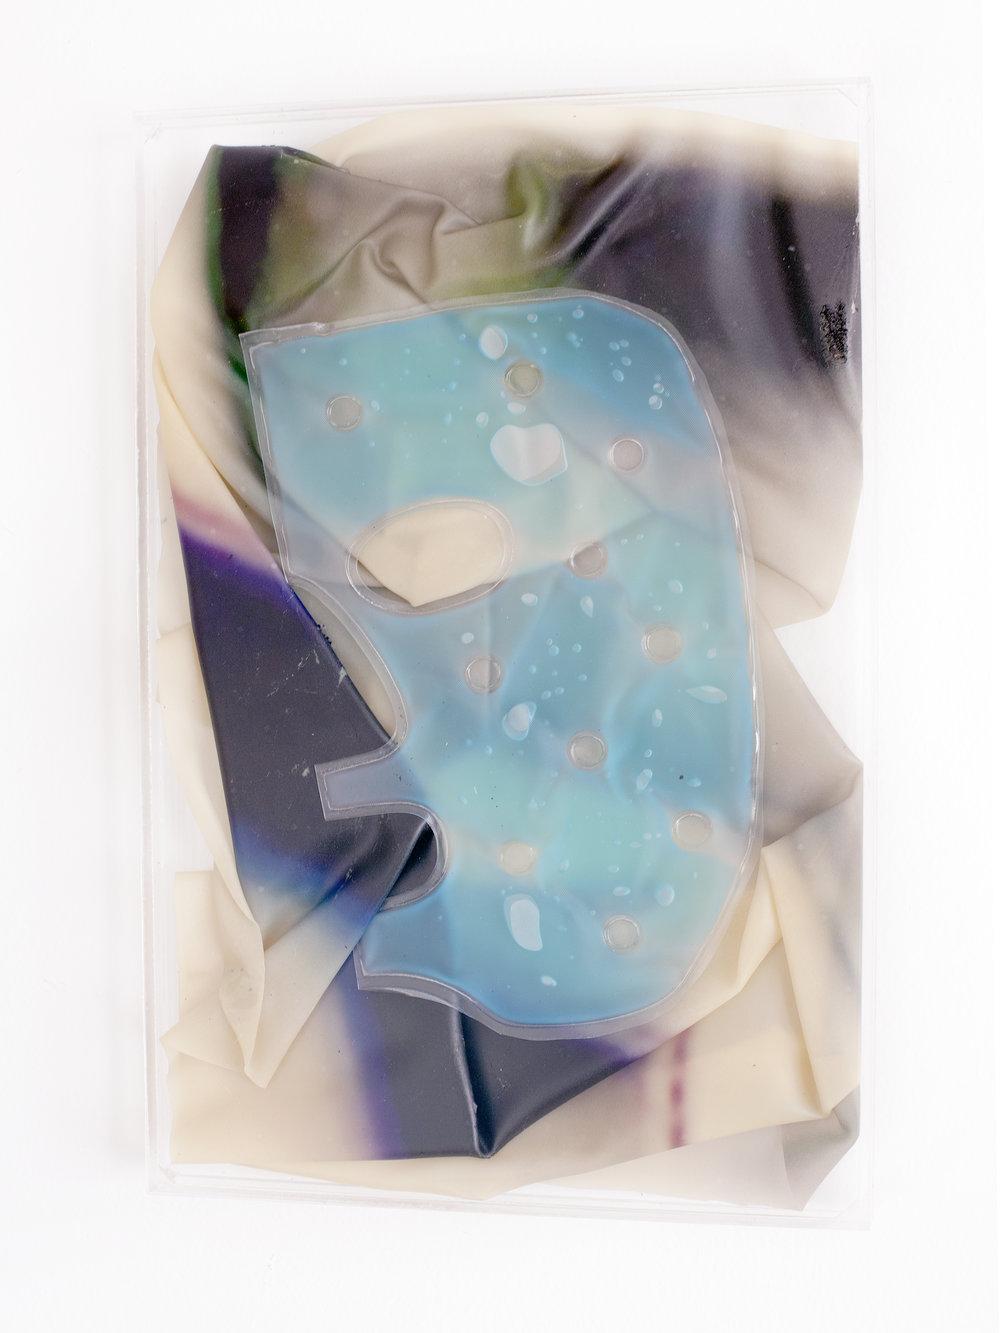 MOONSTRUCK, 2018, sculpture (unique), 30 X 20 x 1,6 cm, inkjetprint on latex, transparent acrylic, ½ face gel mask